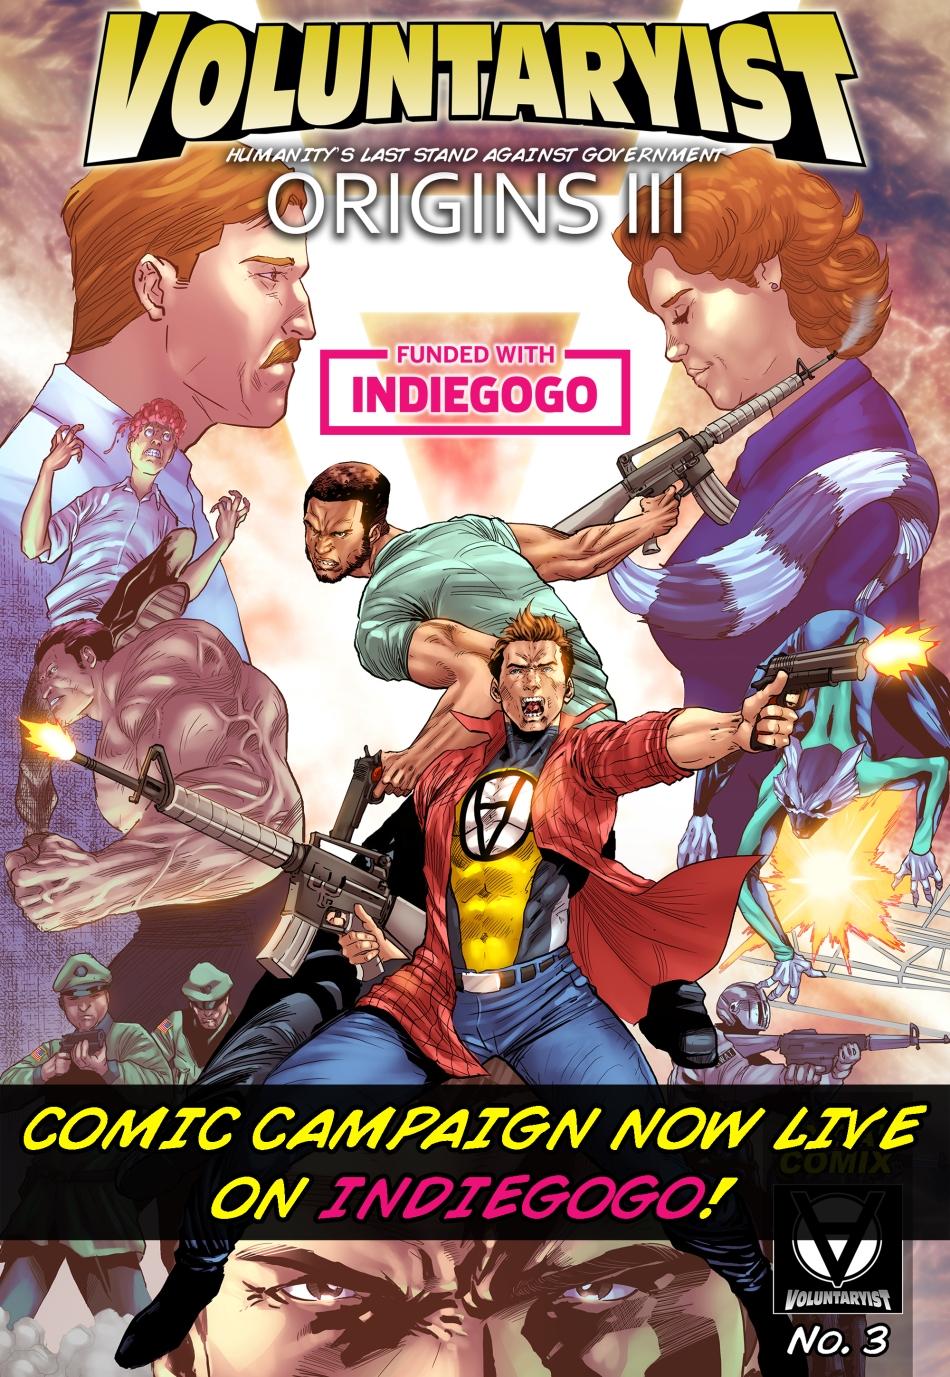 voluntaryist origins III indiegogo promo cover